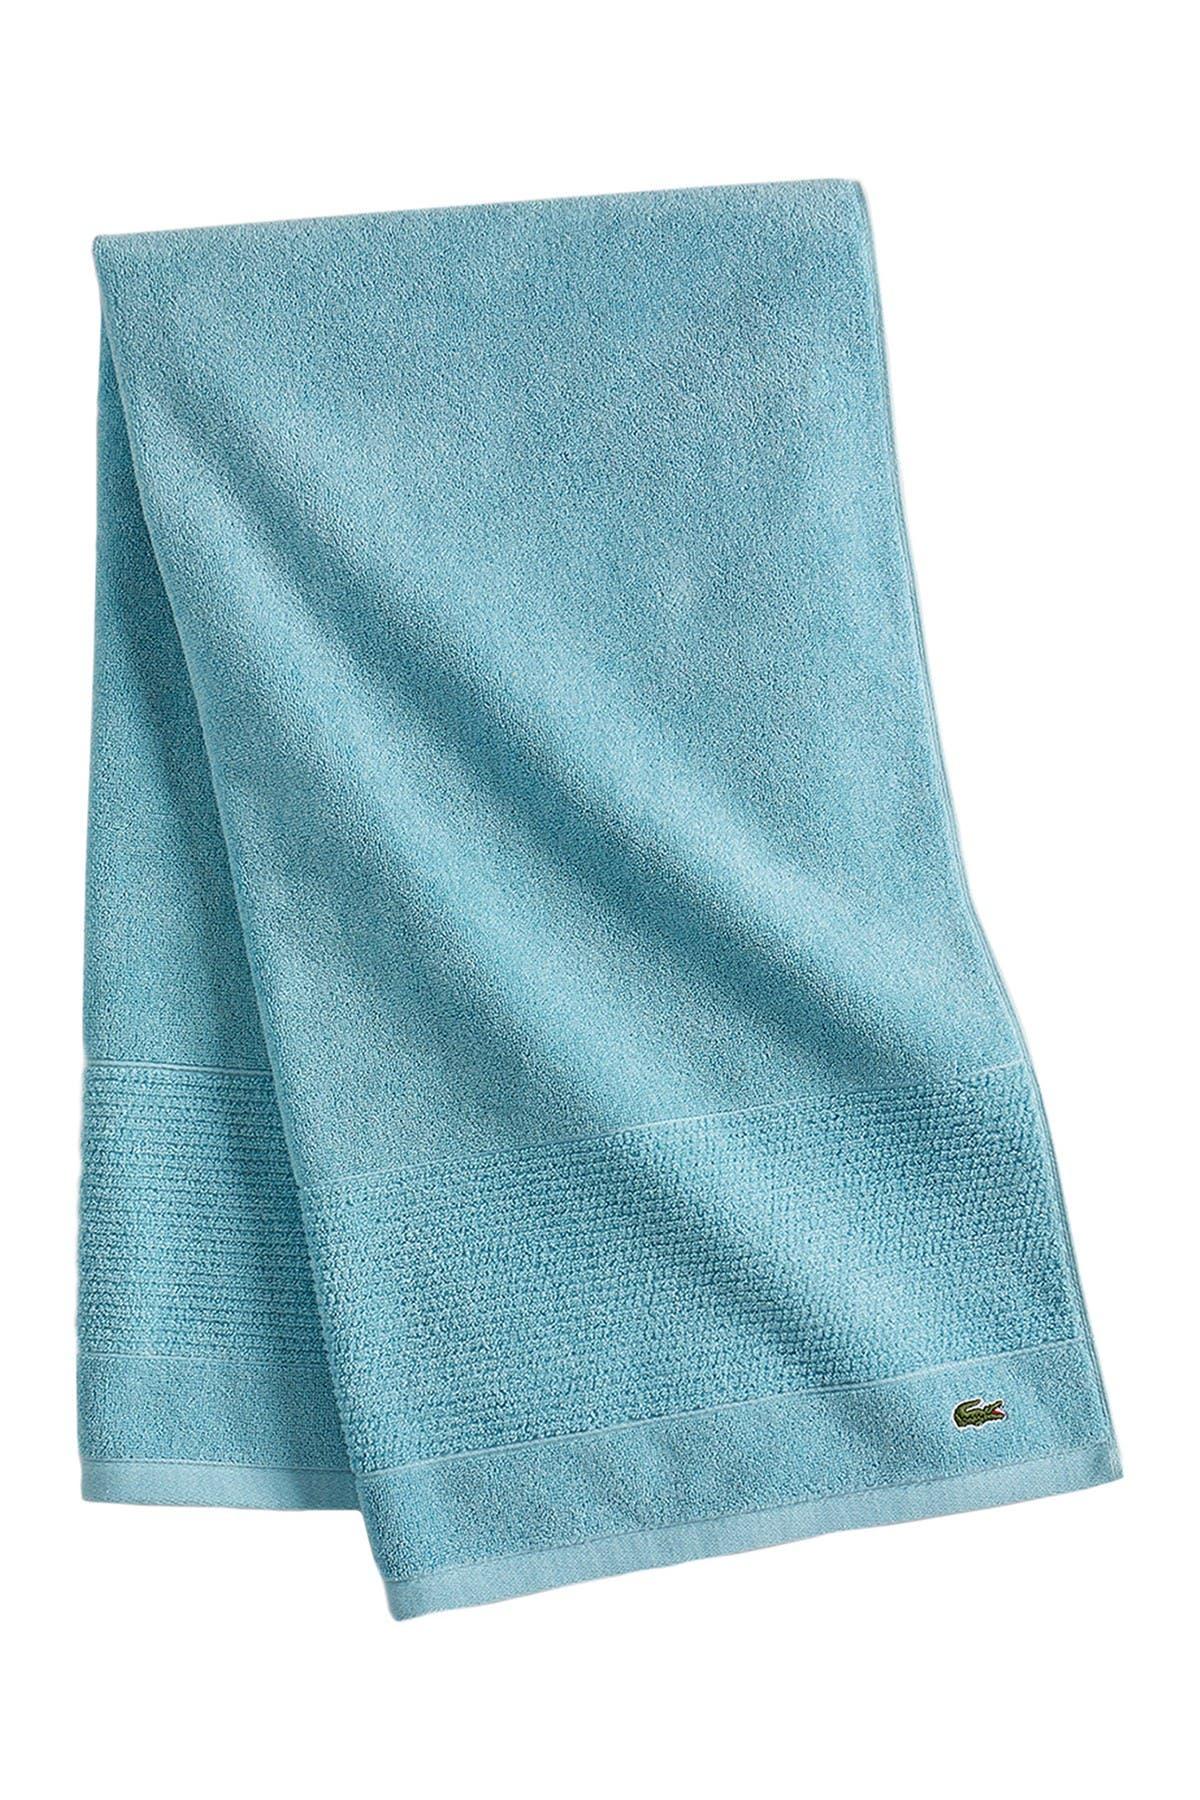 "Image of Lacoste Celestial Blue Legend Supima Cotton Bath Towel - 30"" x 54"""